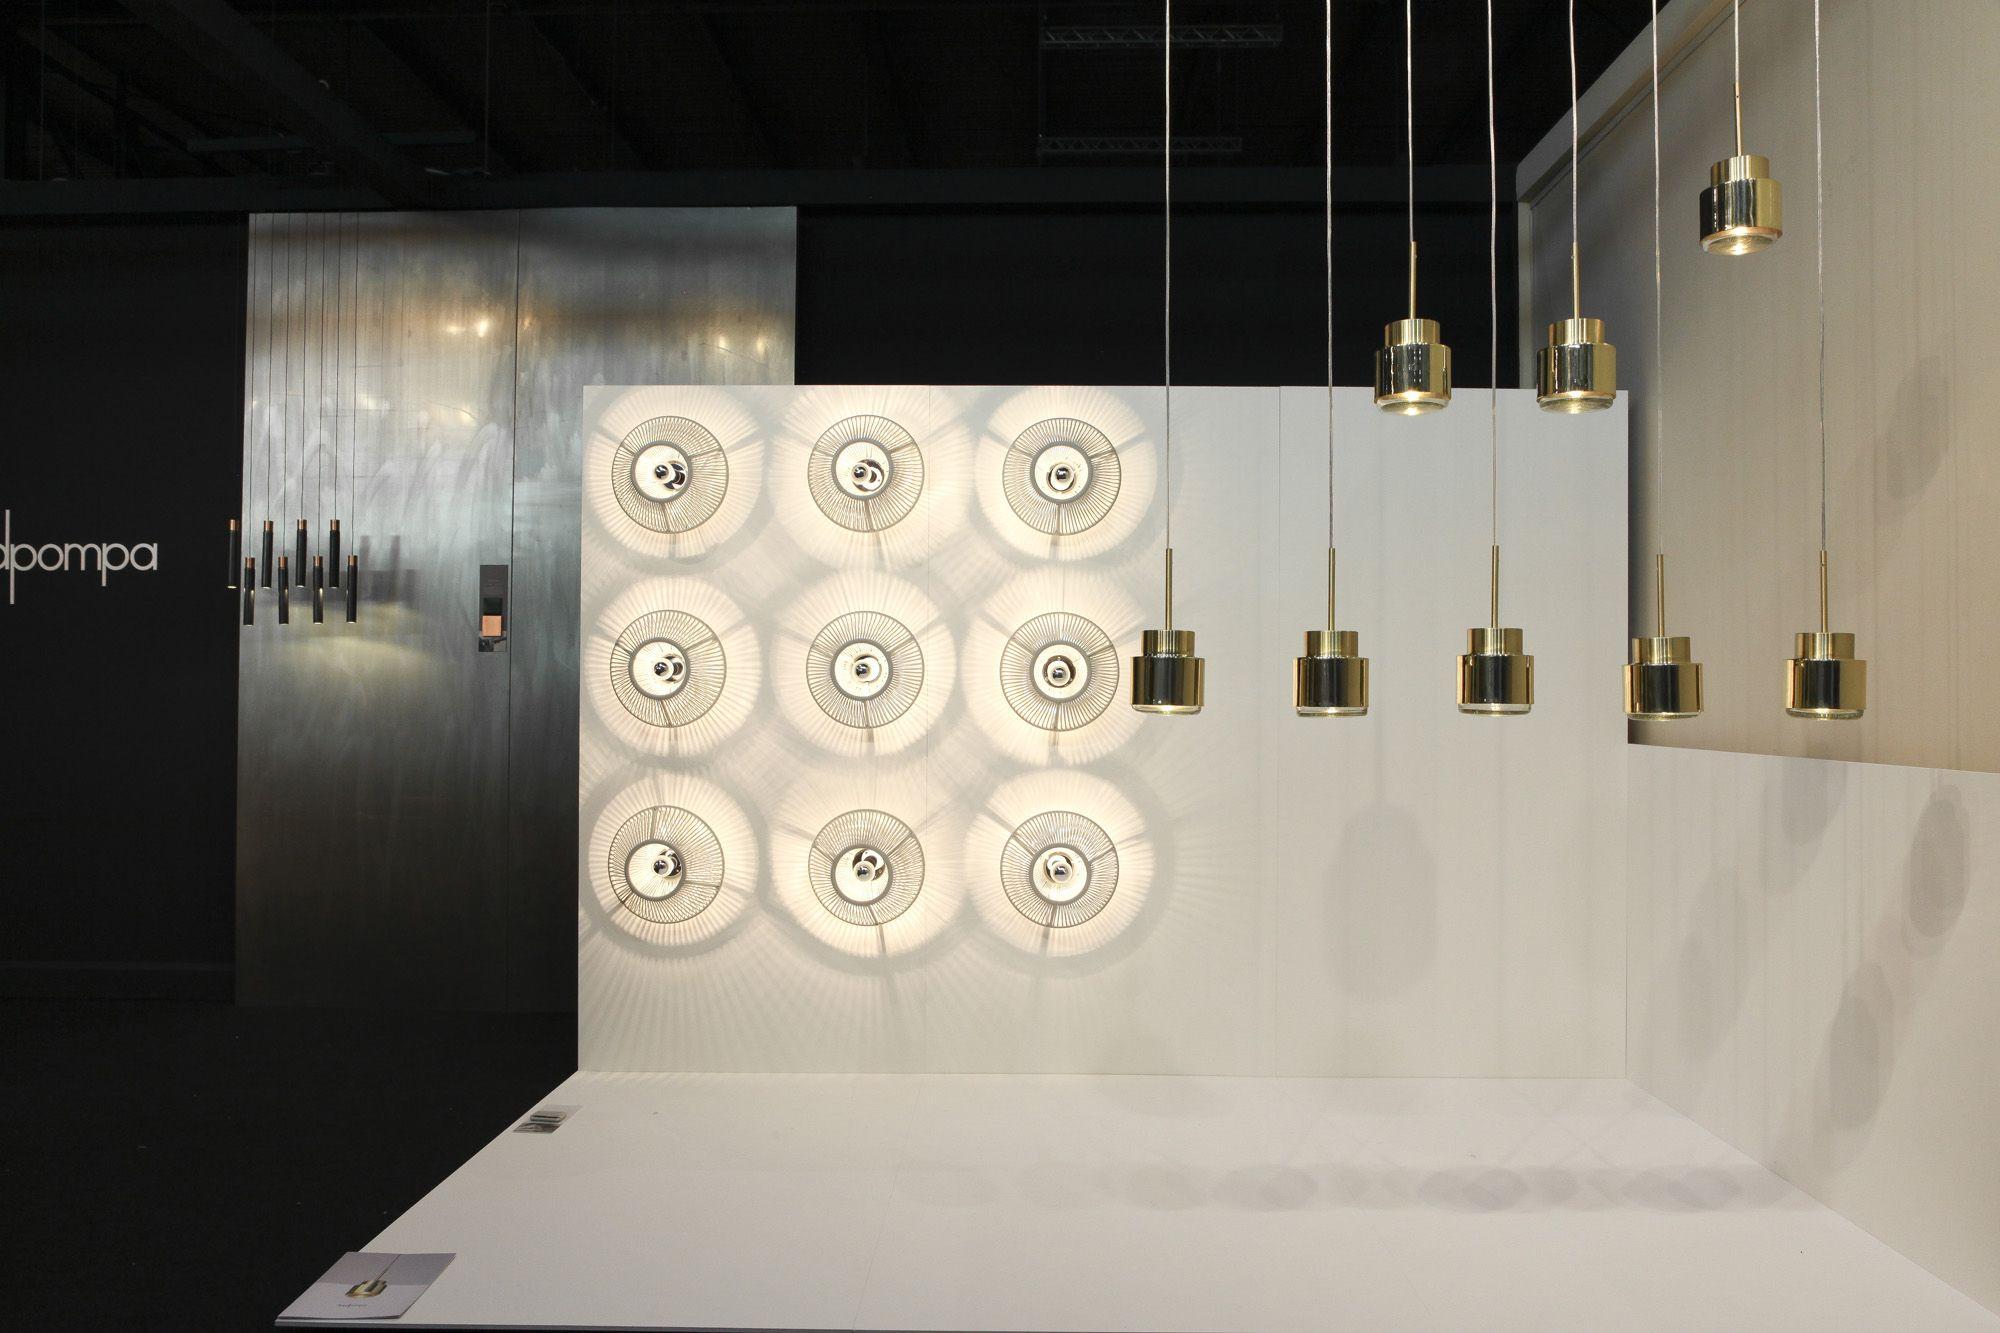 Salone Satellite / Salone del Mobile / 2016 / davidpompa #ffe #lighting #design #lightingdesign #homedesign #interiordesign